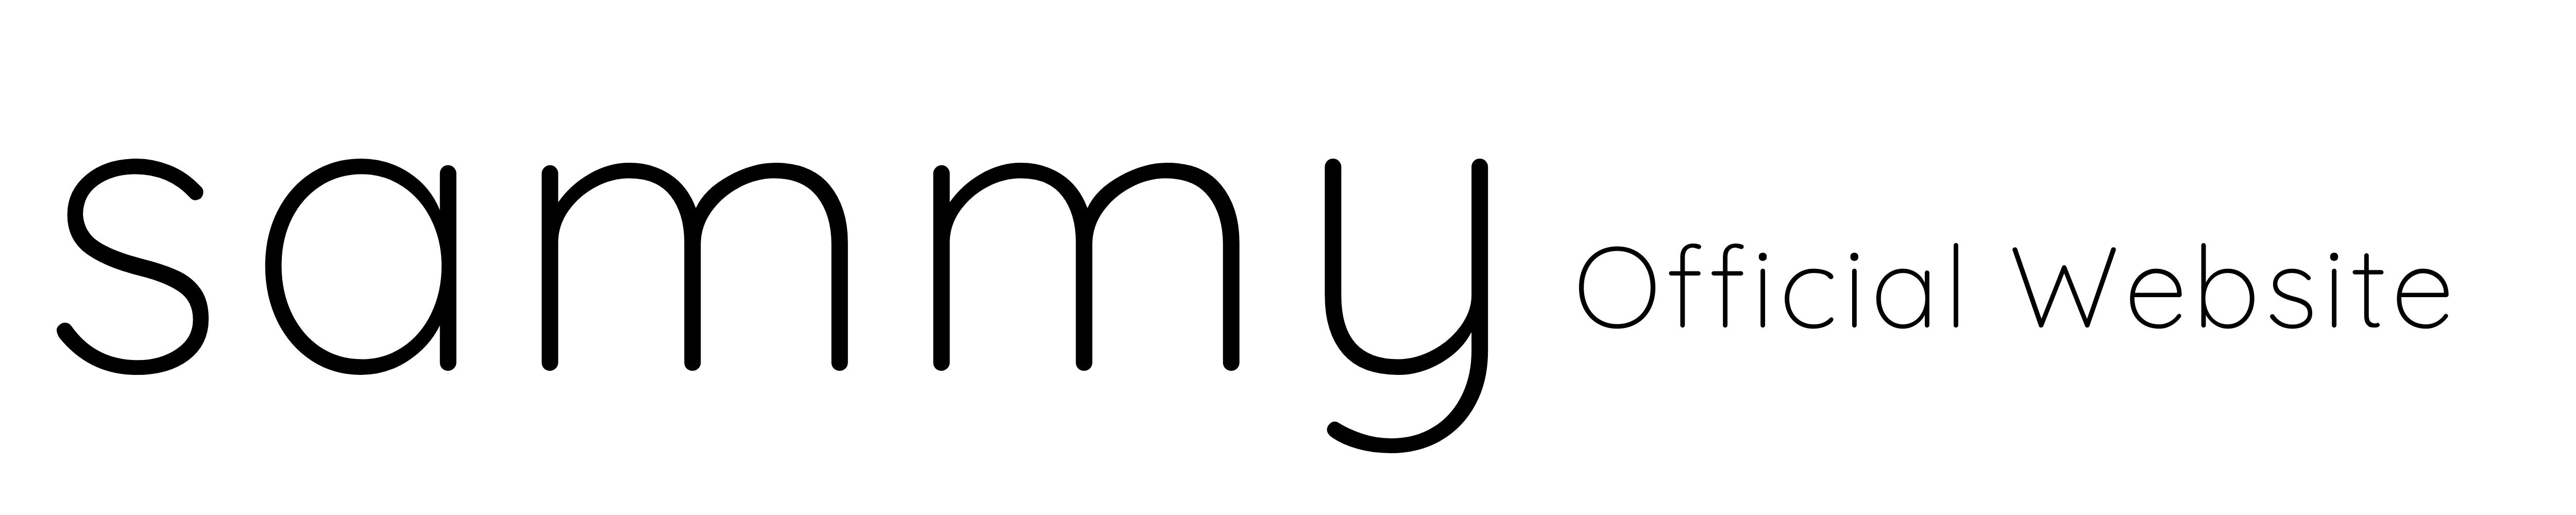 sammy official website